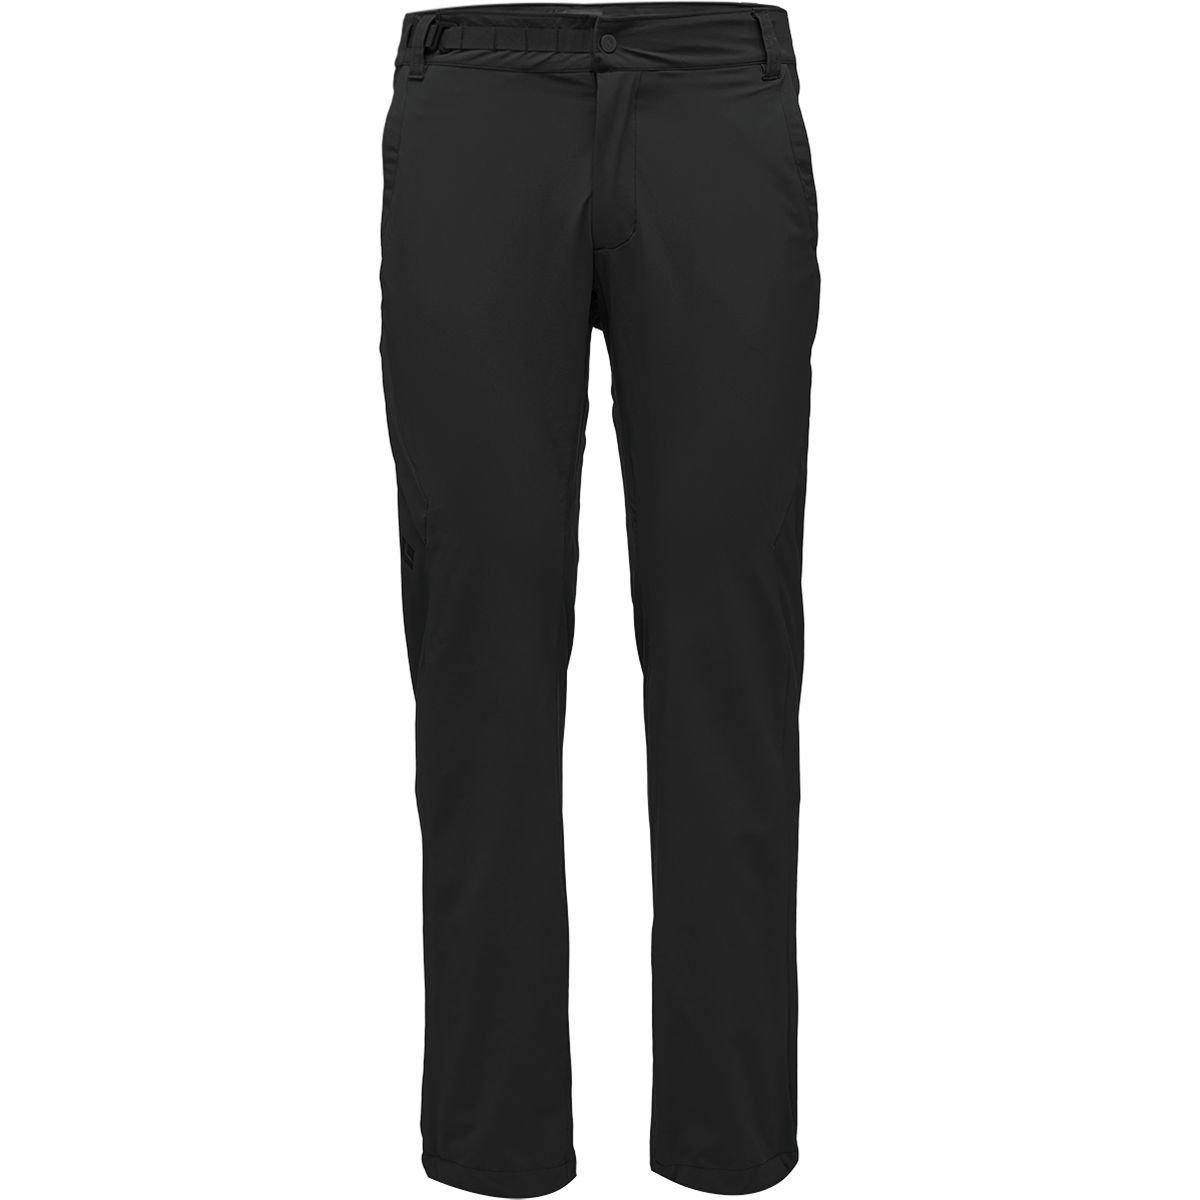 Black Diamond M Alpine Light Pants Hose für Herren